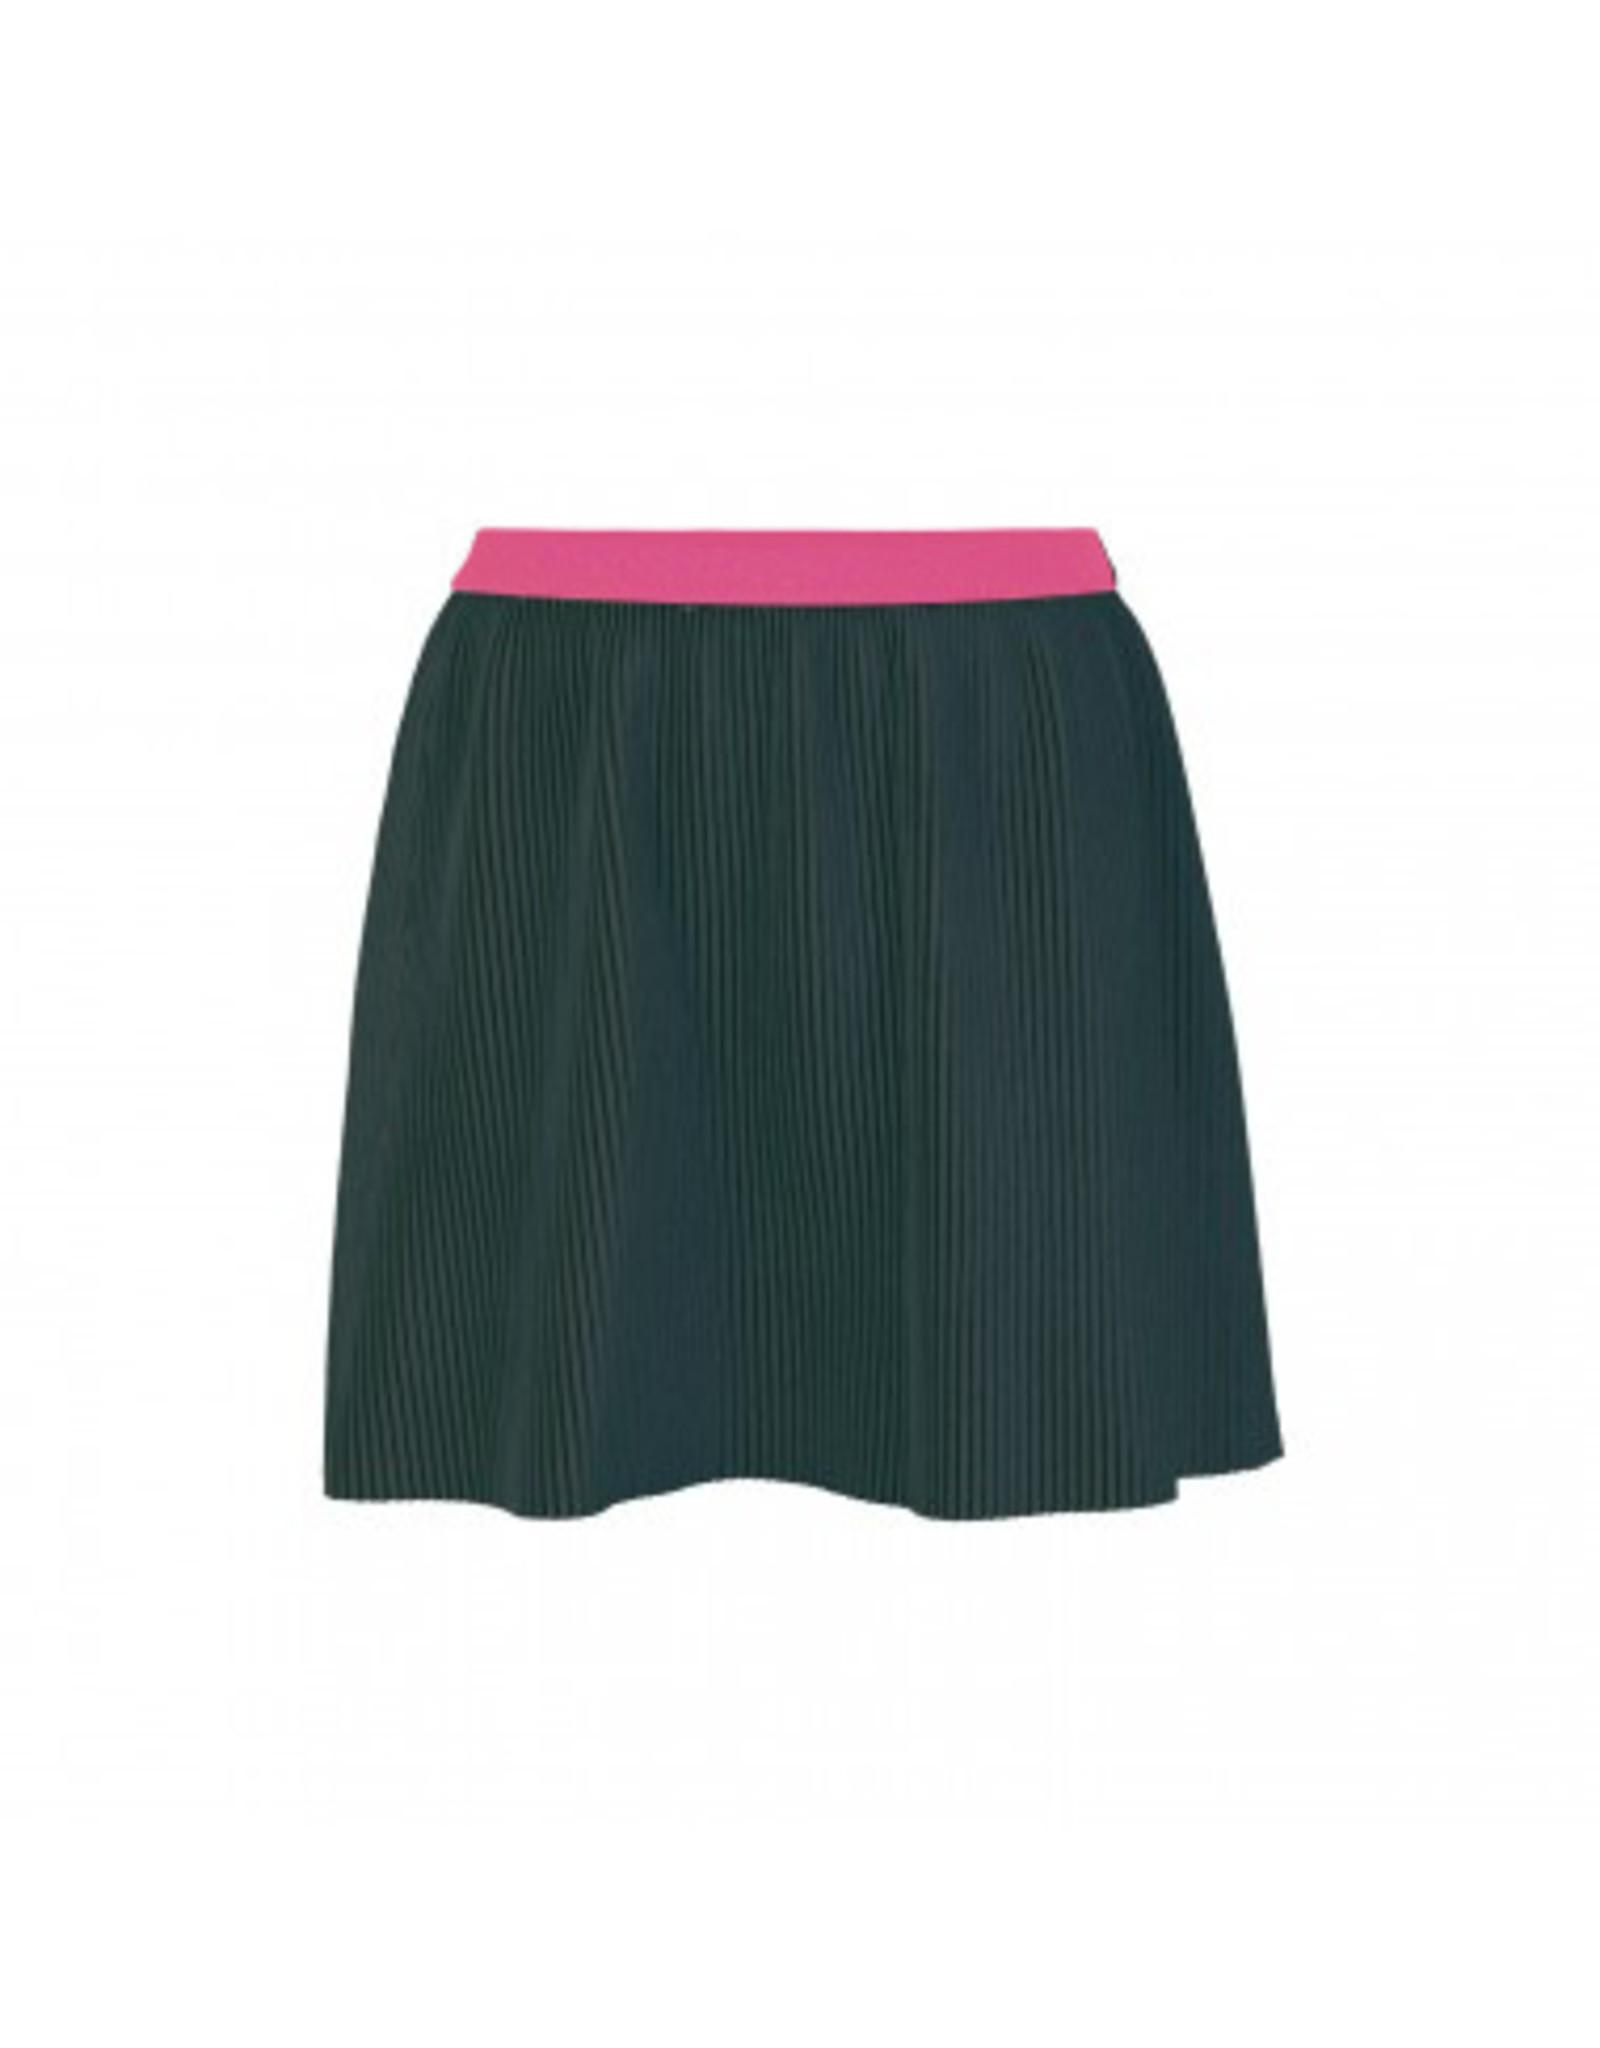 Little Miss Juliette 40-1547 Skirt velours bls